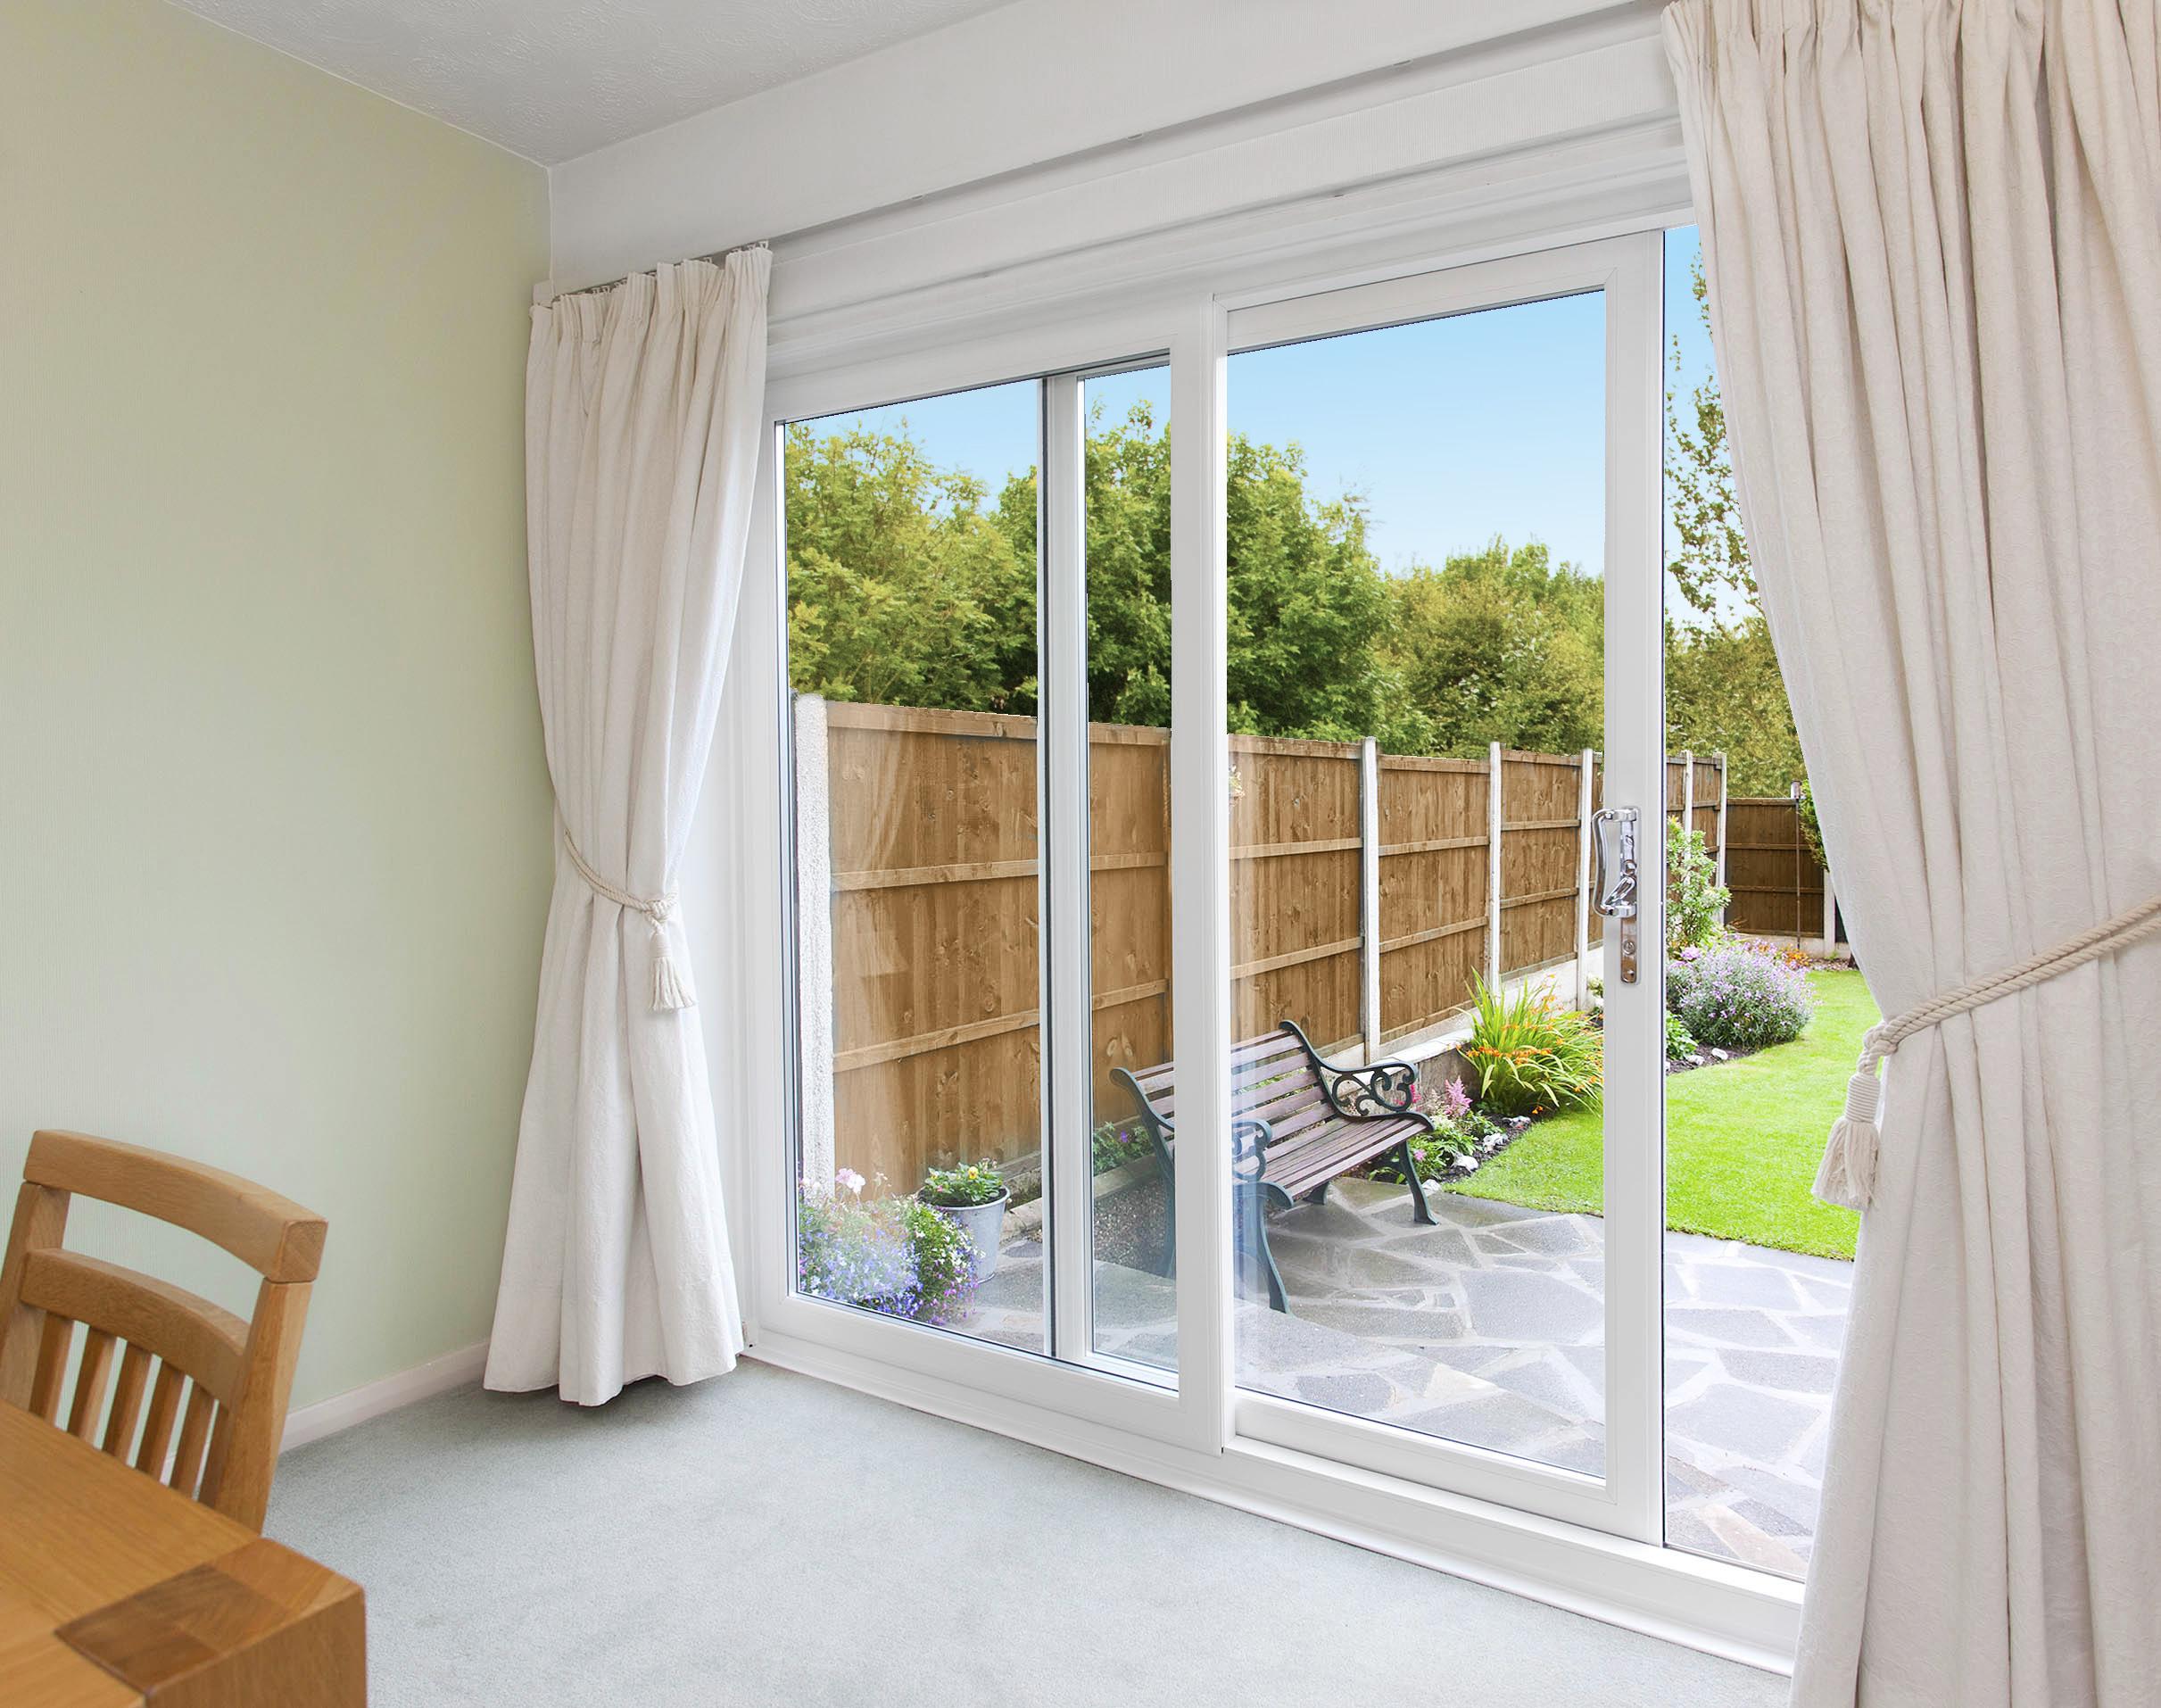 Patio sliding doors southampton eastleigh upvc doors upvc patio doors eventelaan Choice Image